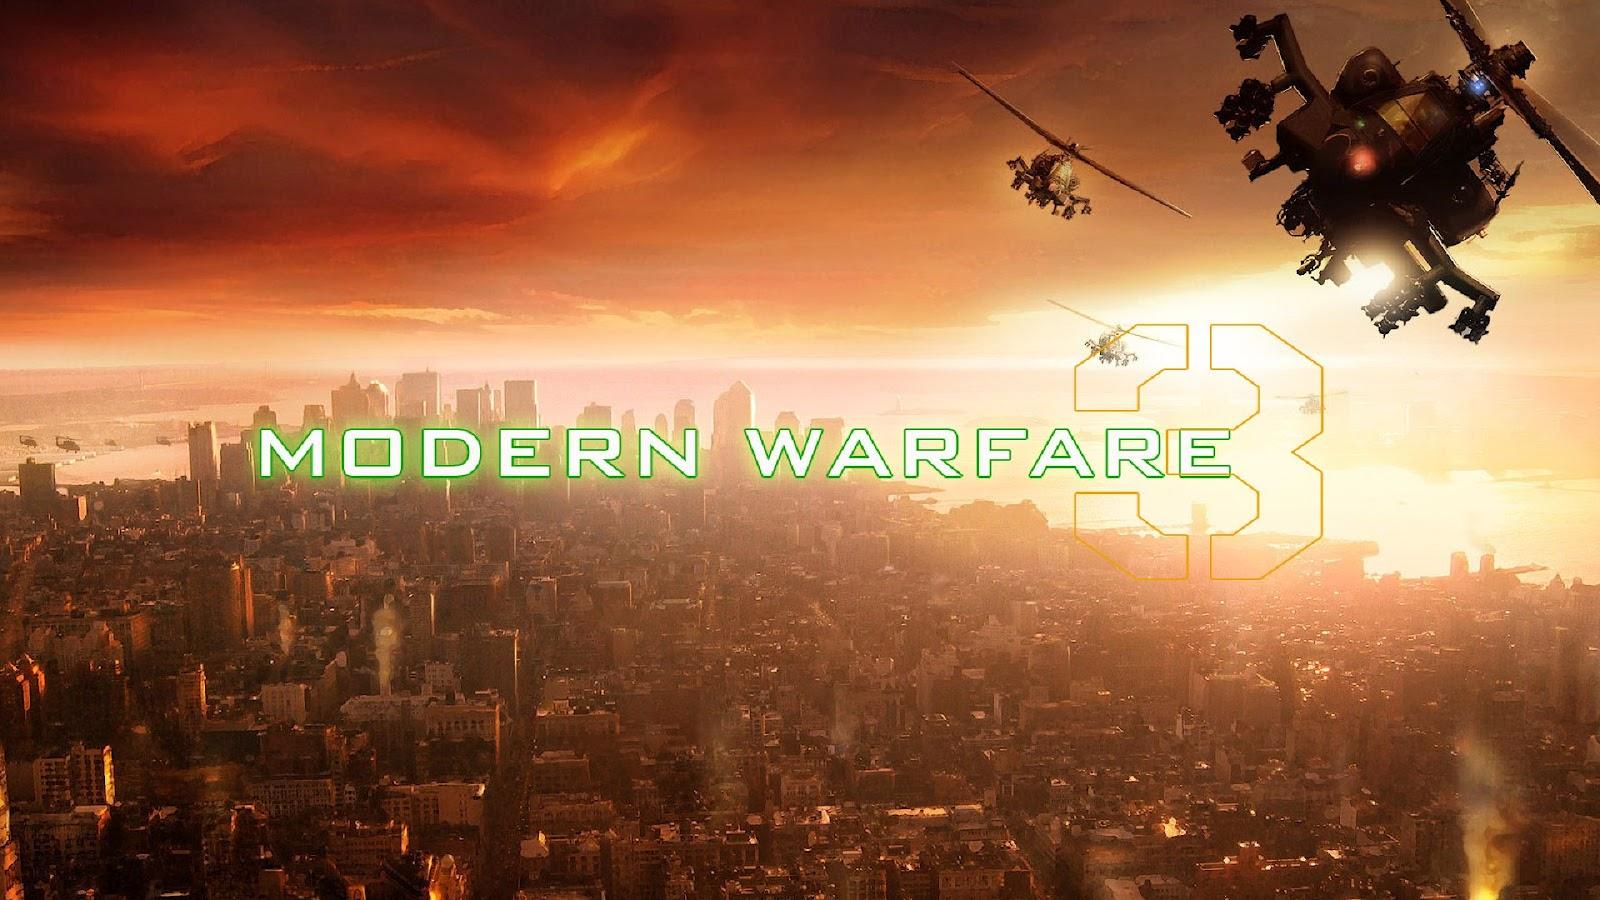 http://2.bp.blogspot.com/-LZvthzobUJY/UBCfDv03niI/AAAAAAAABpk/CBdieqnHWWU/s1600/call-of-duty-modern-warfare-3-wallpaper-13.jpg